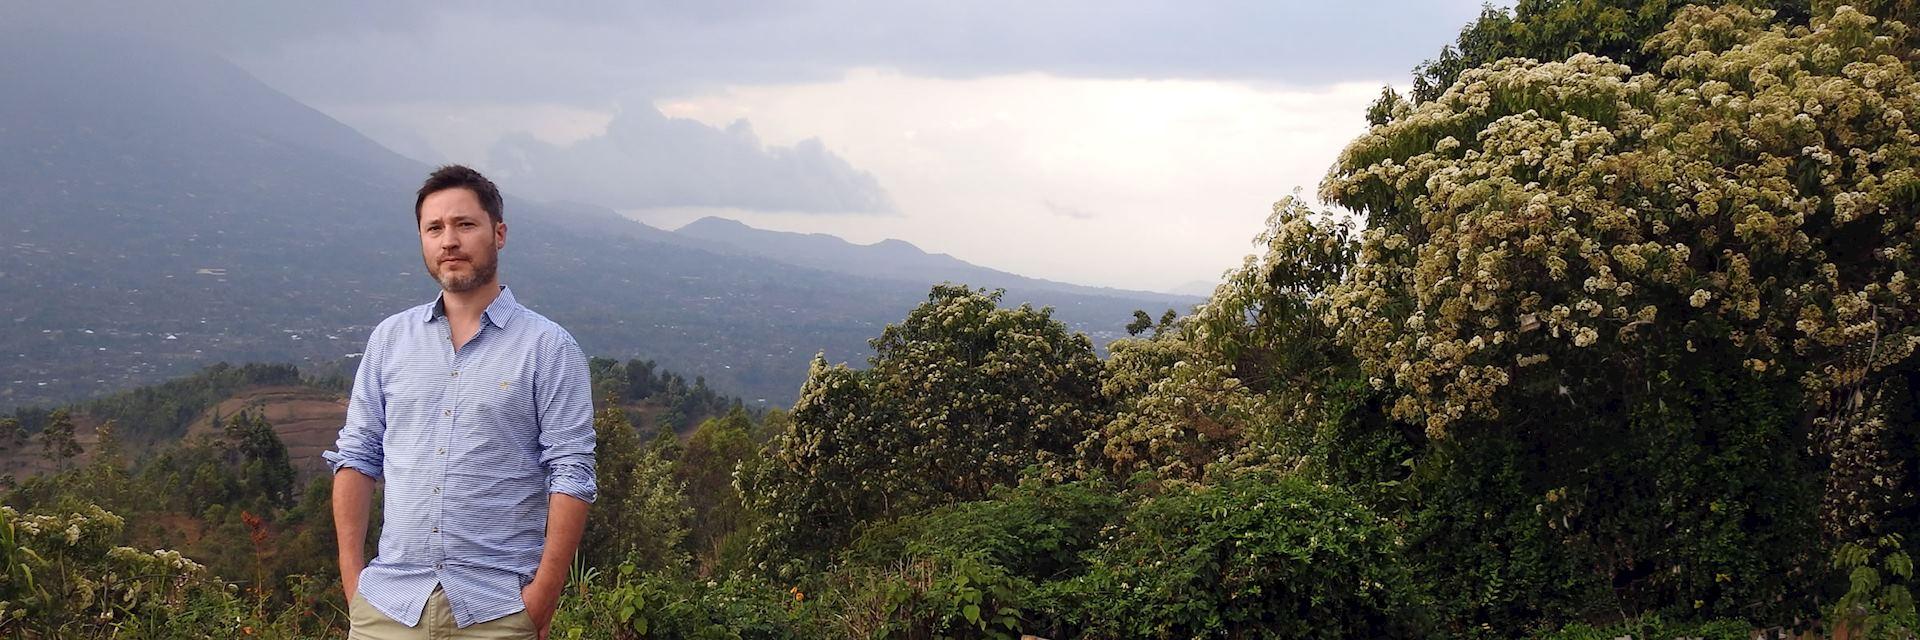 Toby in Virunga National Park, Rwanda